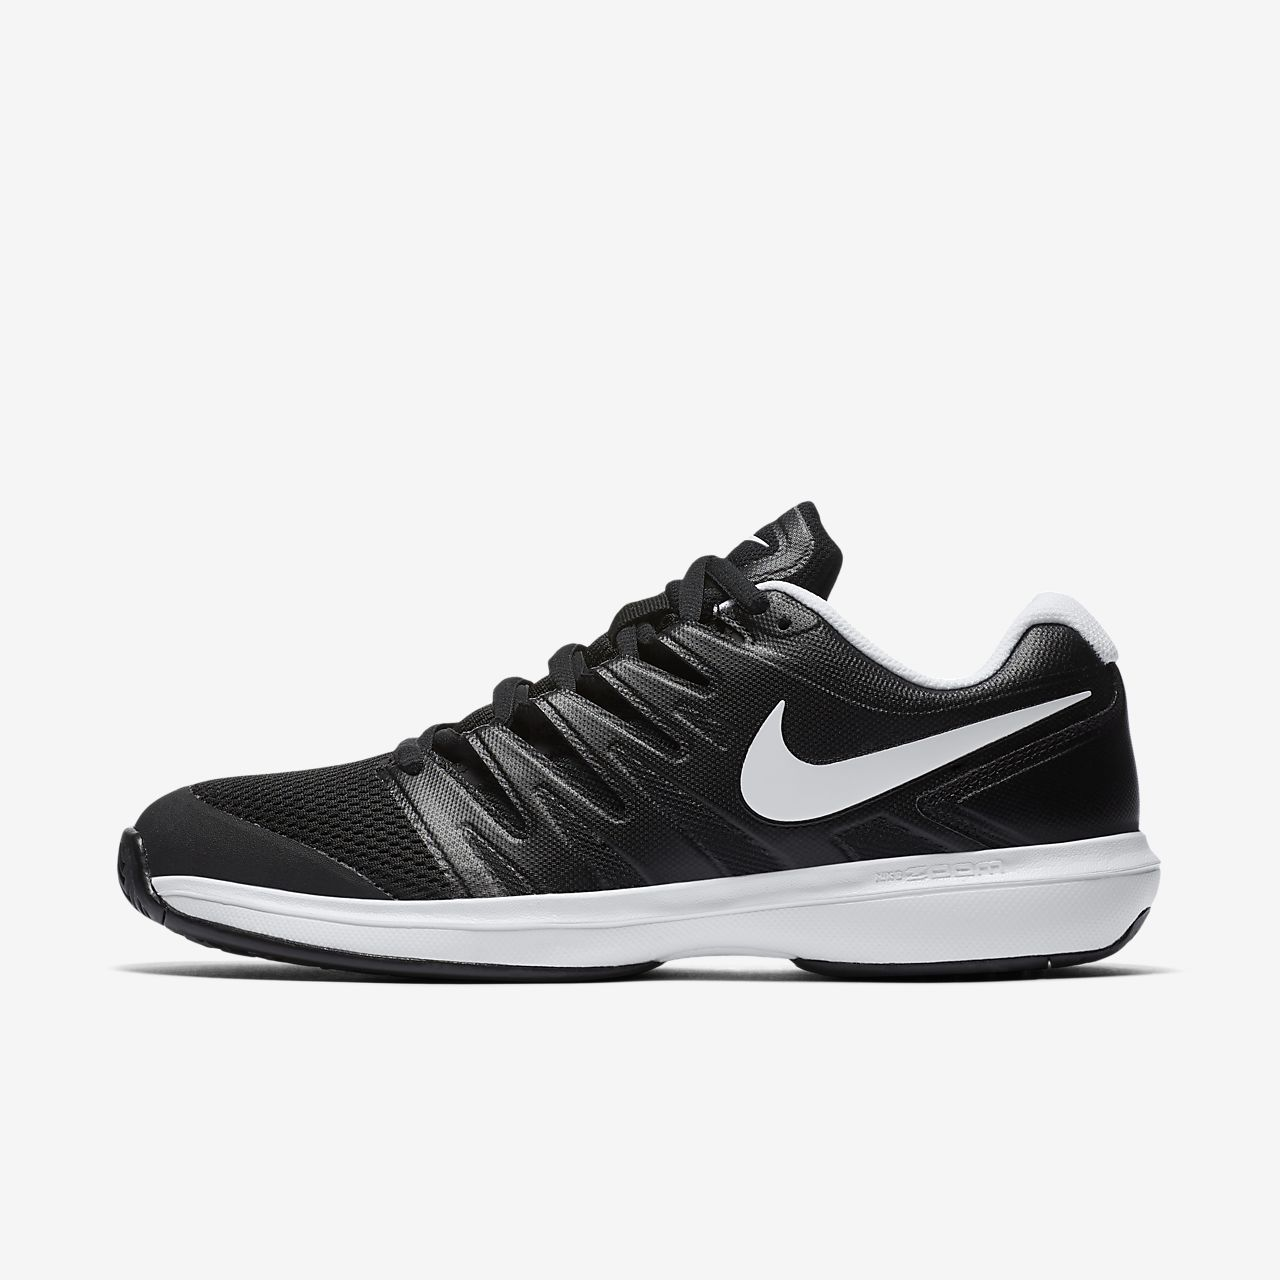 finest selection 00a21 06483 ... NikeCourt Air Zoom Prestige Herren-Tennisschuh für Hartplätze